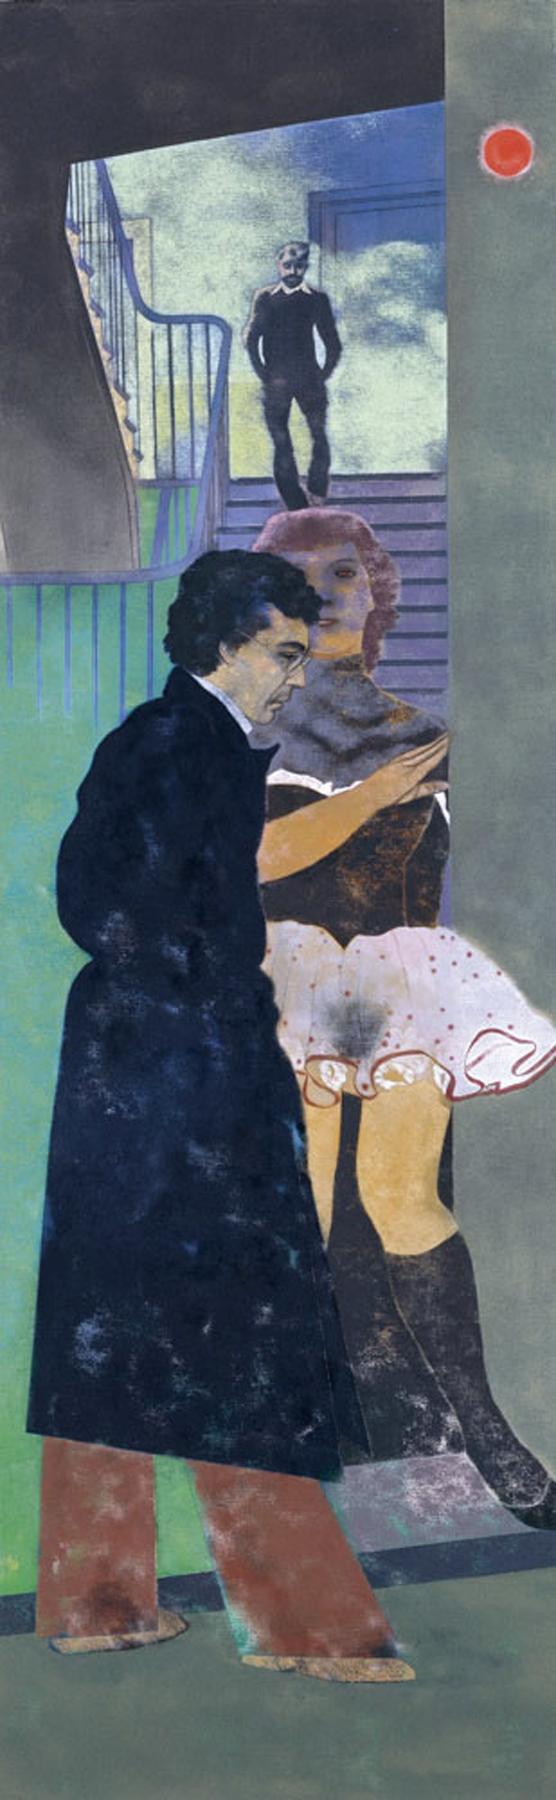 Ronald B. Kitaj Smyrna Greek (Nikos) 1976-77 Oil on canvas . 243.8 x 76.2 cm Museo Thyssen-Bornemisza, Madrid